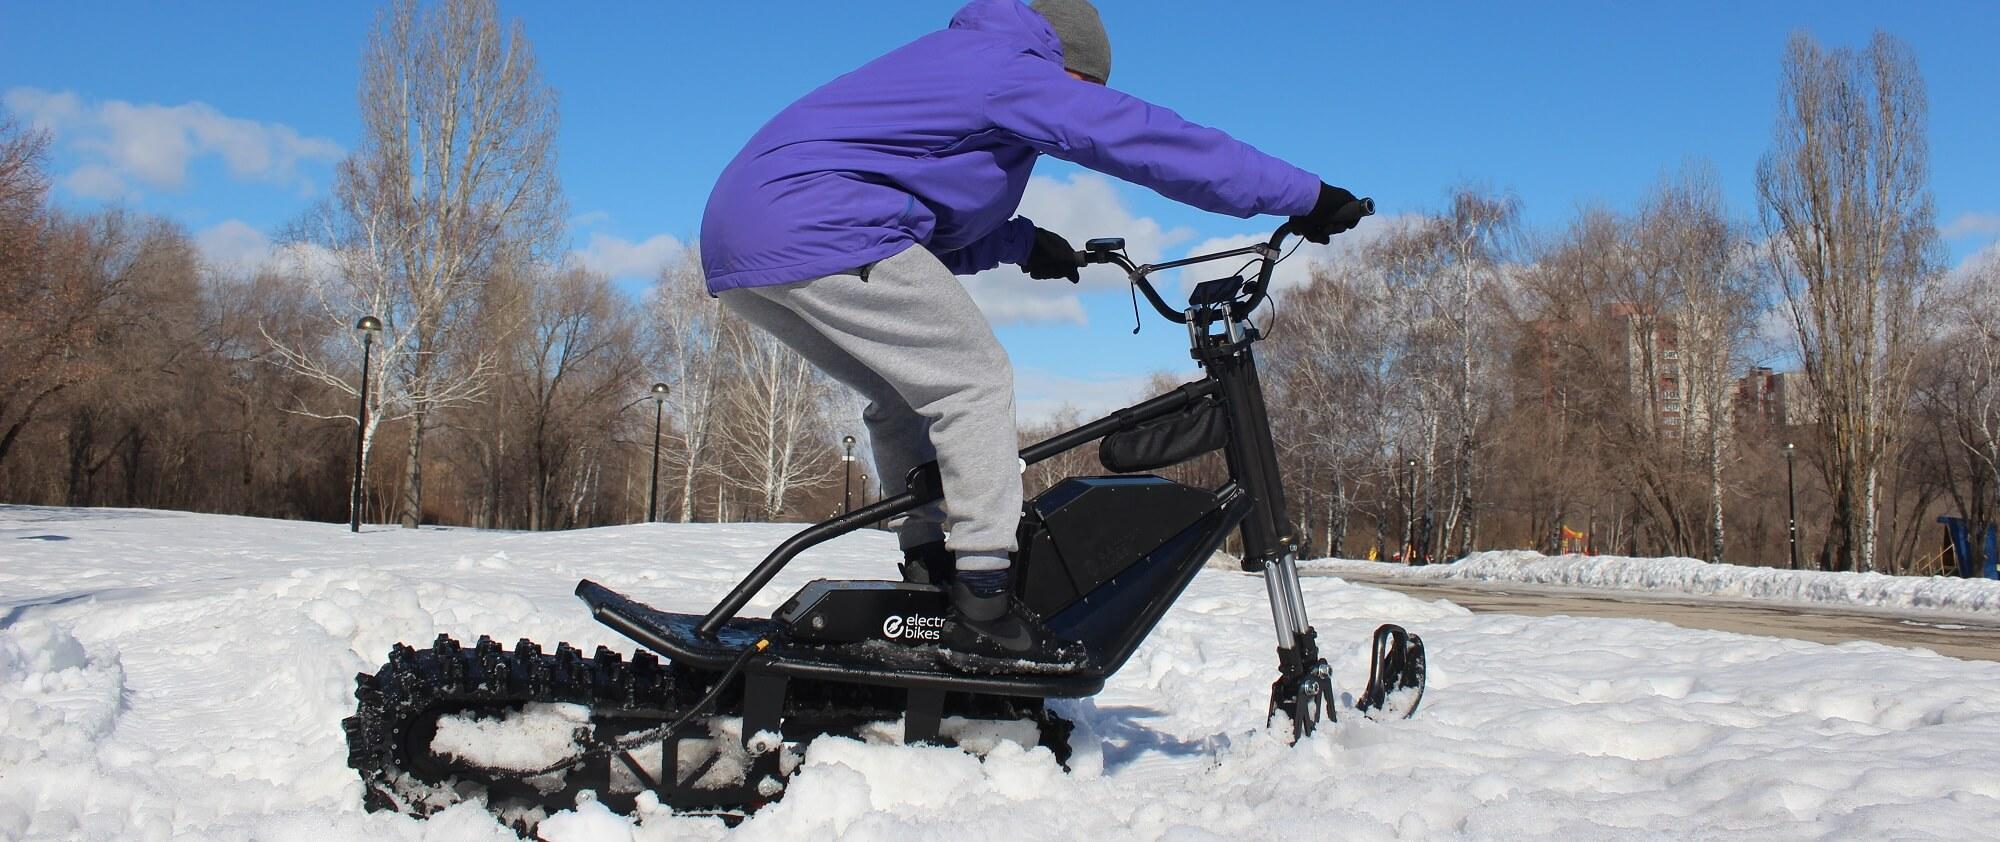 Elecrtric-snowbike_slider_9